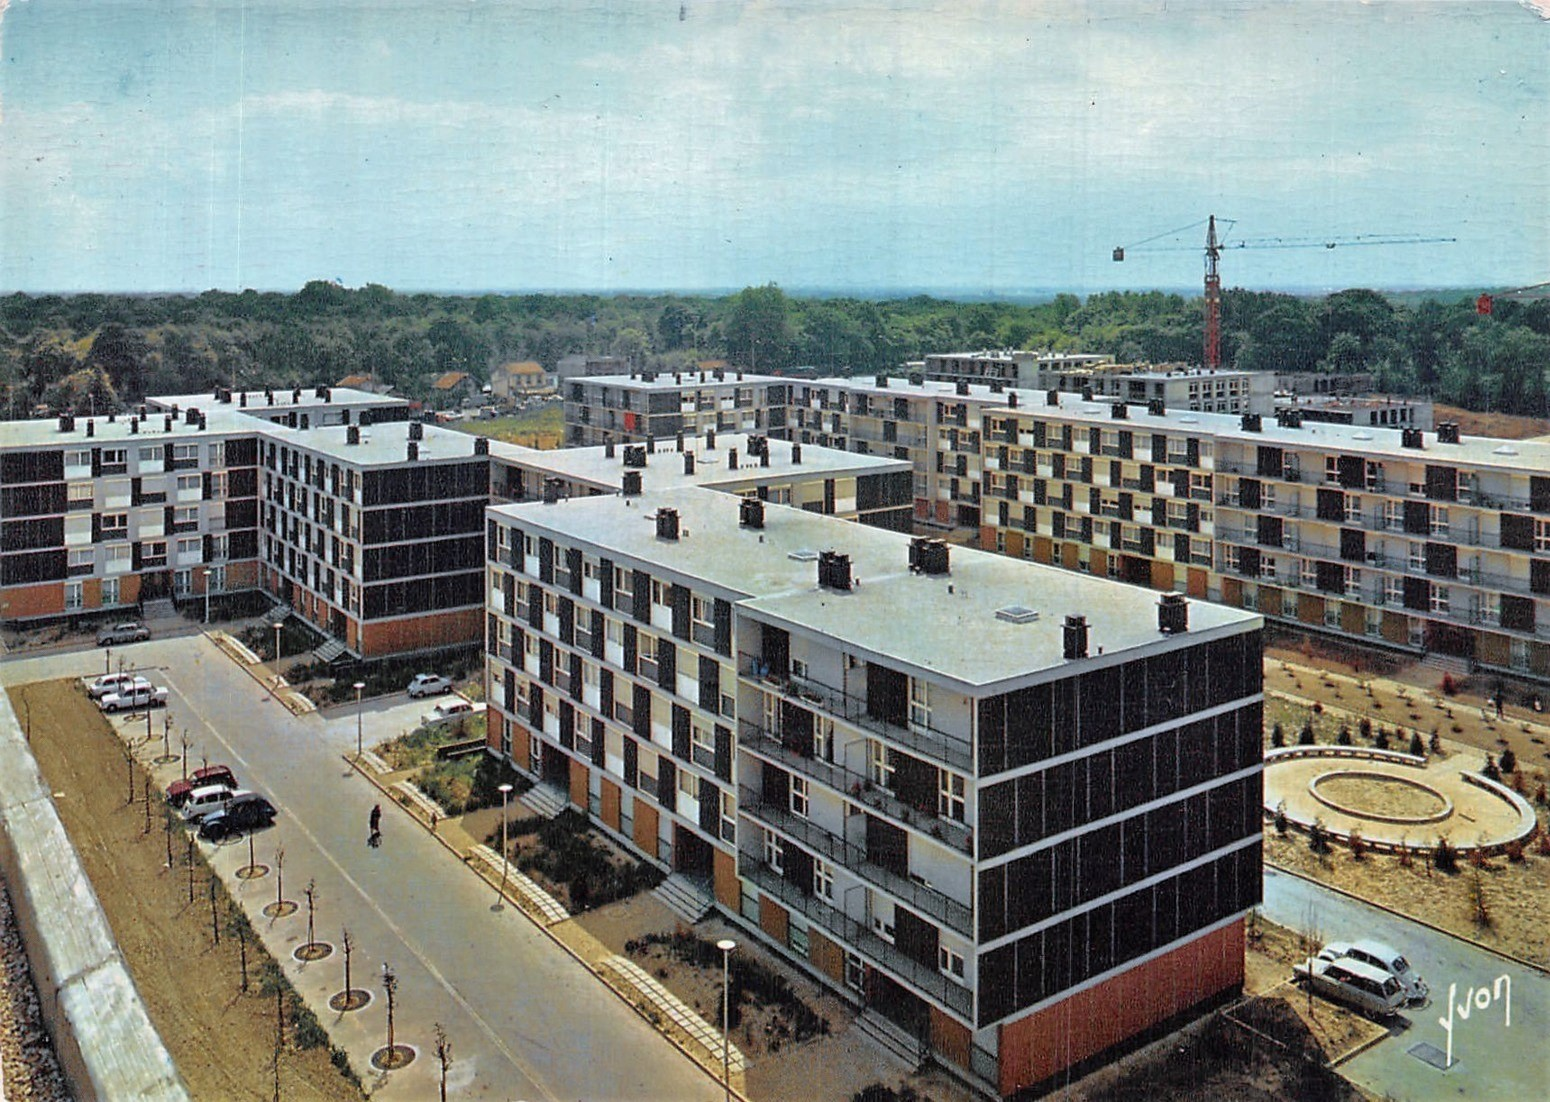 Vélizy-Villacoublay - Résidence Leclerc - Date d'oblitération : 31.07.1986